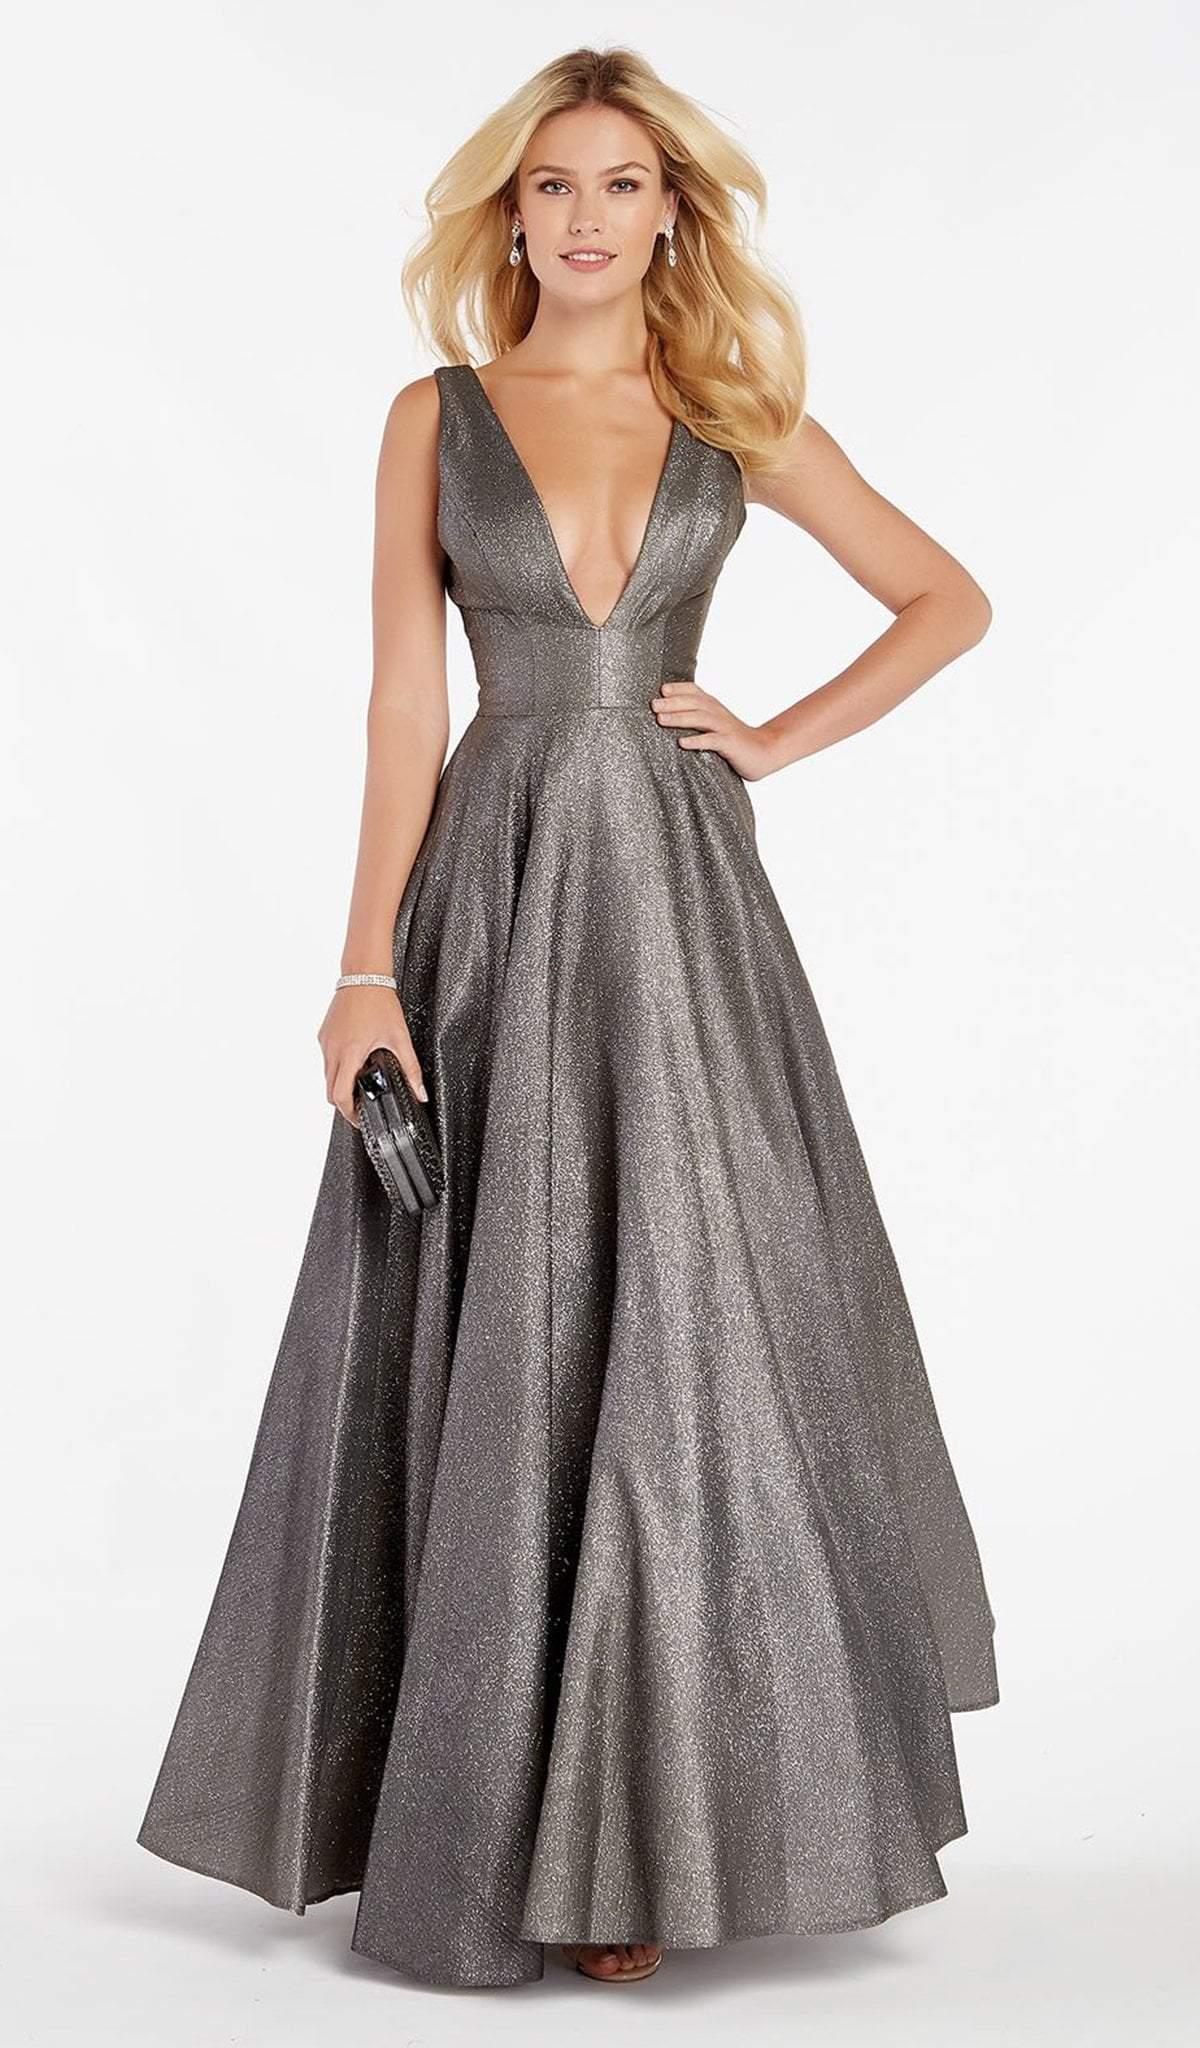 Alyce Paris - 60563 Sexy Plunging V Neckline Shimmering Taffeta Gown